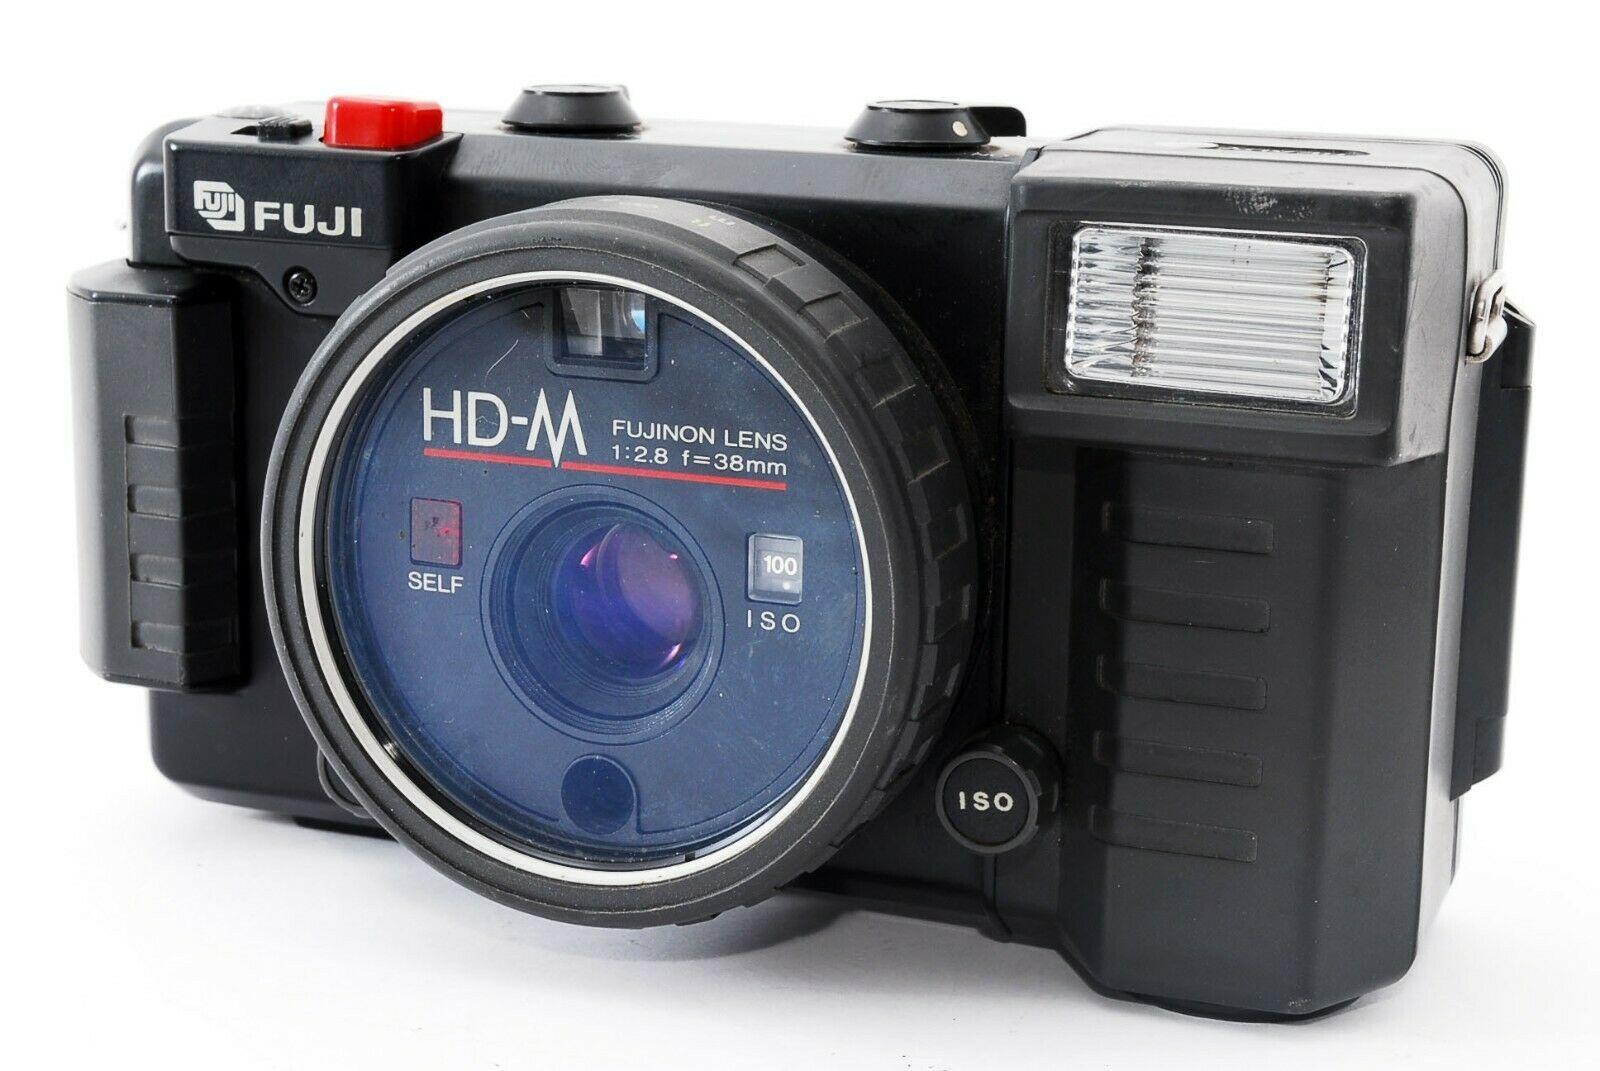 Fuji HD-M Fujinon 38mm F/2.8 Film Fotocamera [ Per Parti ] Da Giappone - $52.97